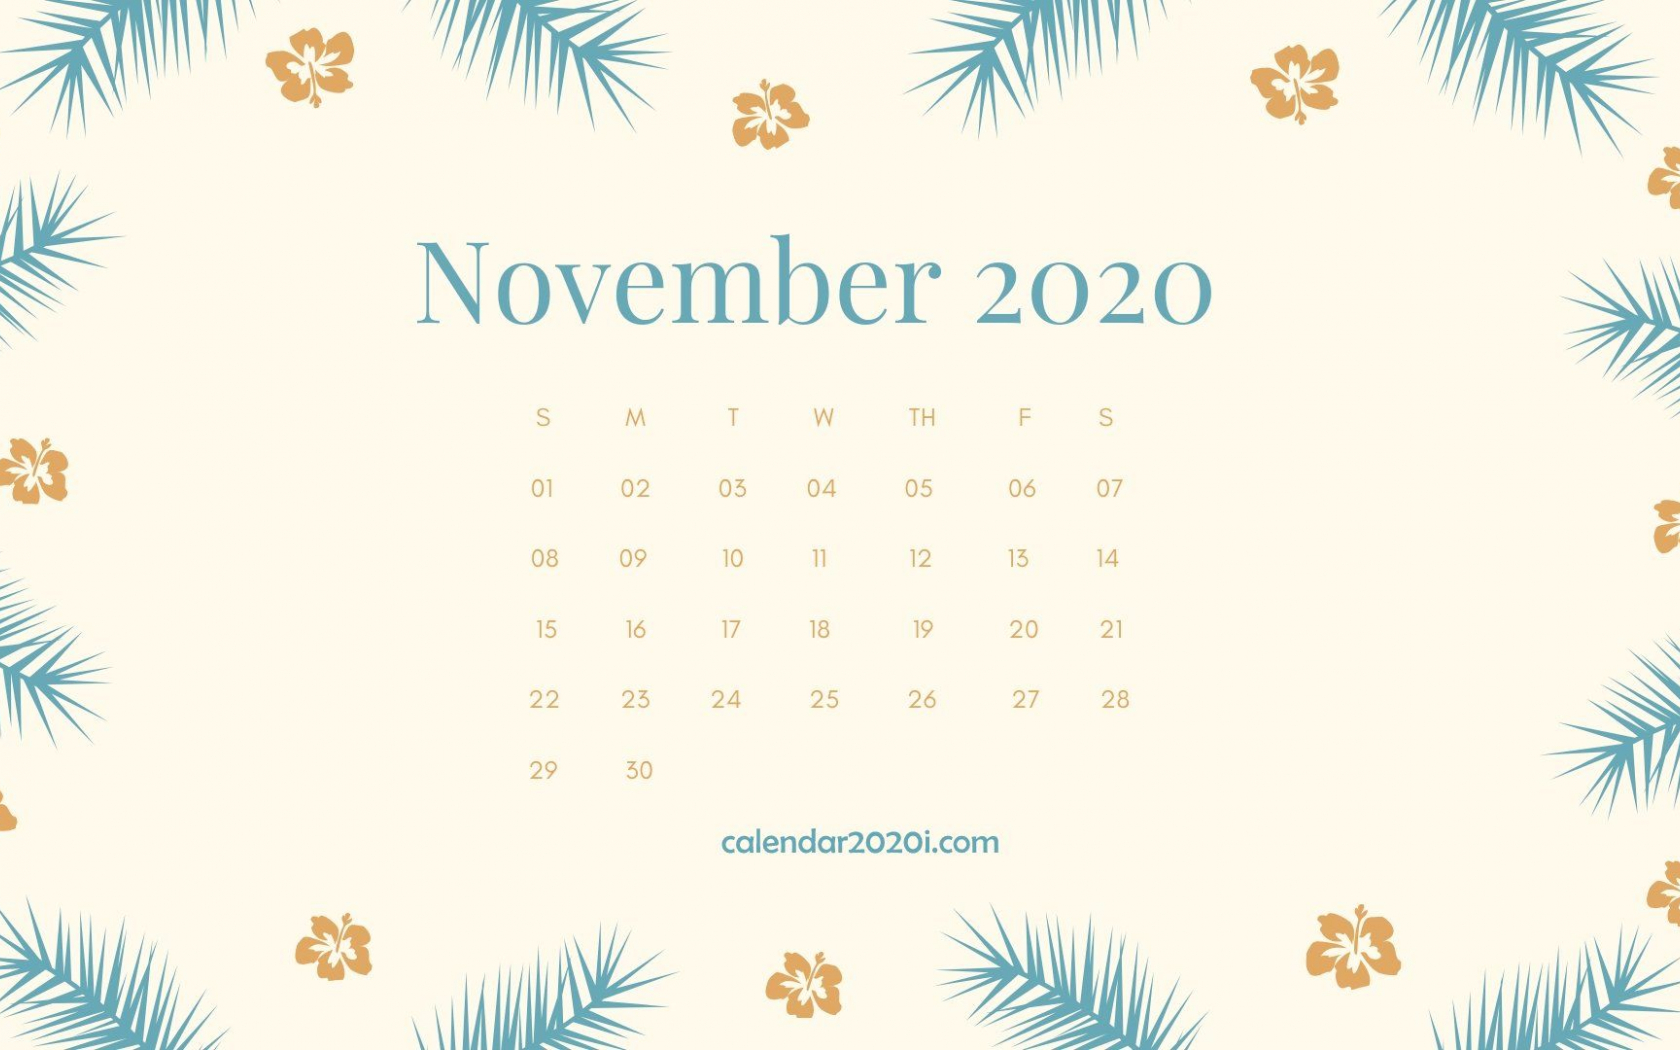 November 2020 Calendar Wallpapers Top ...